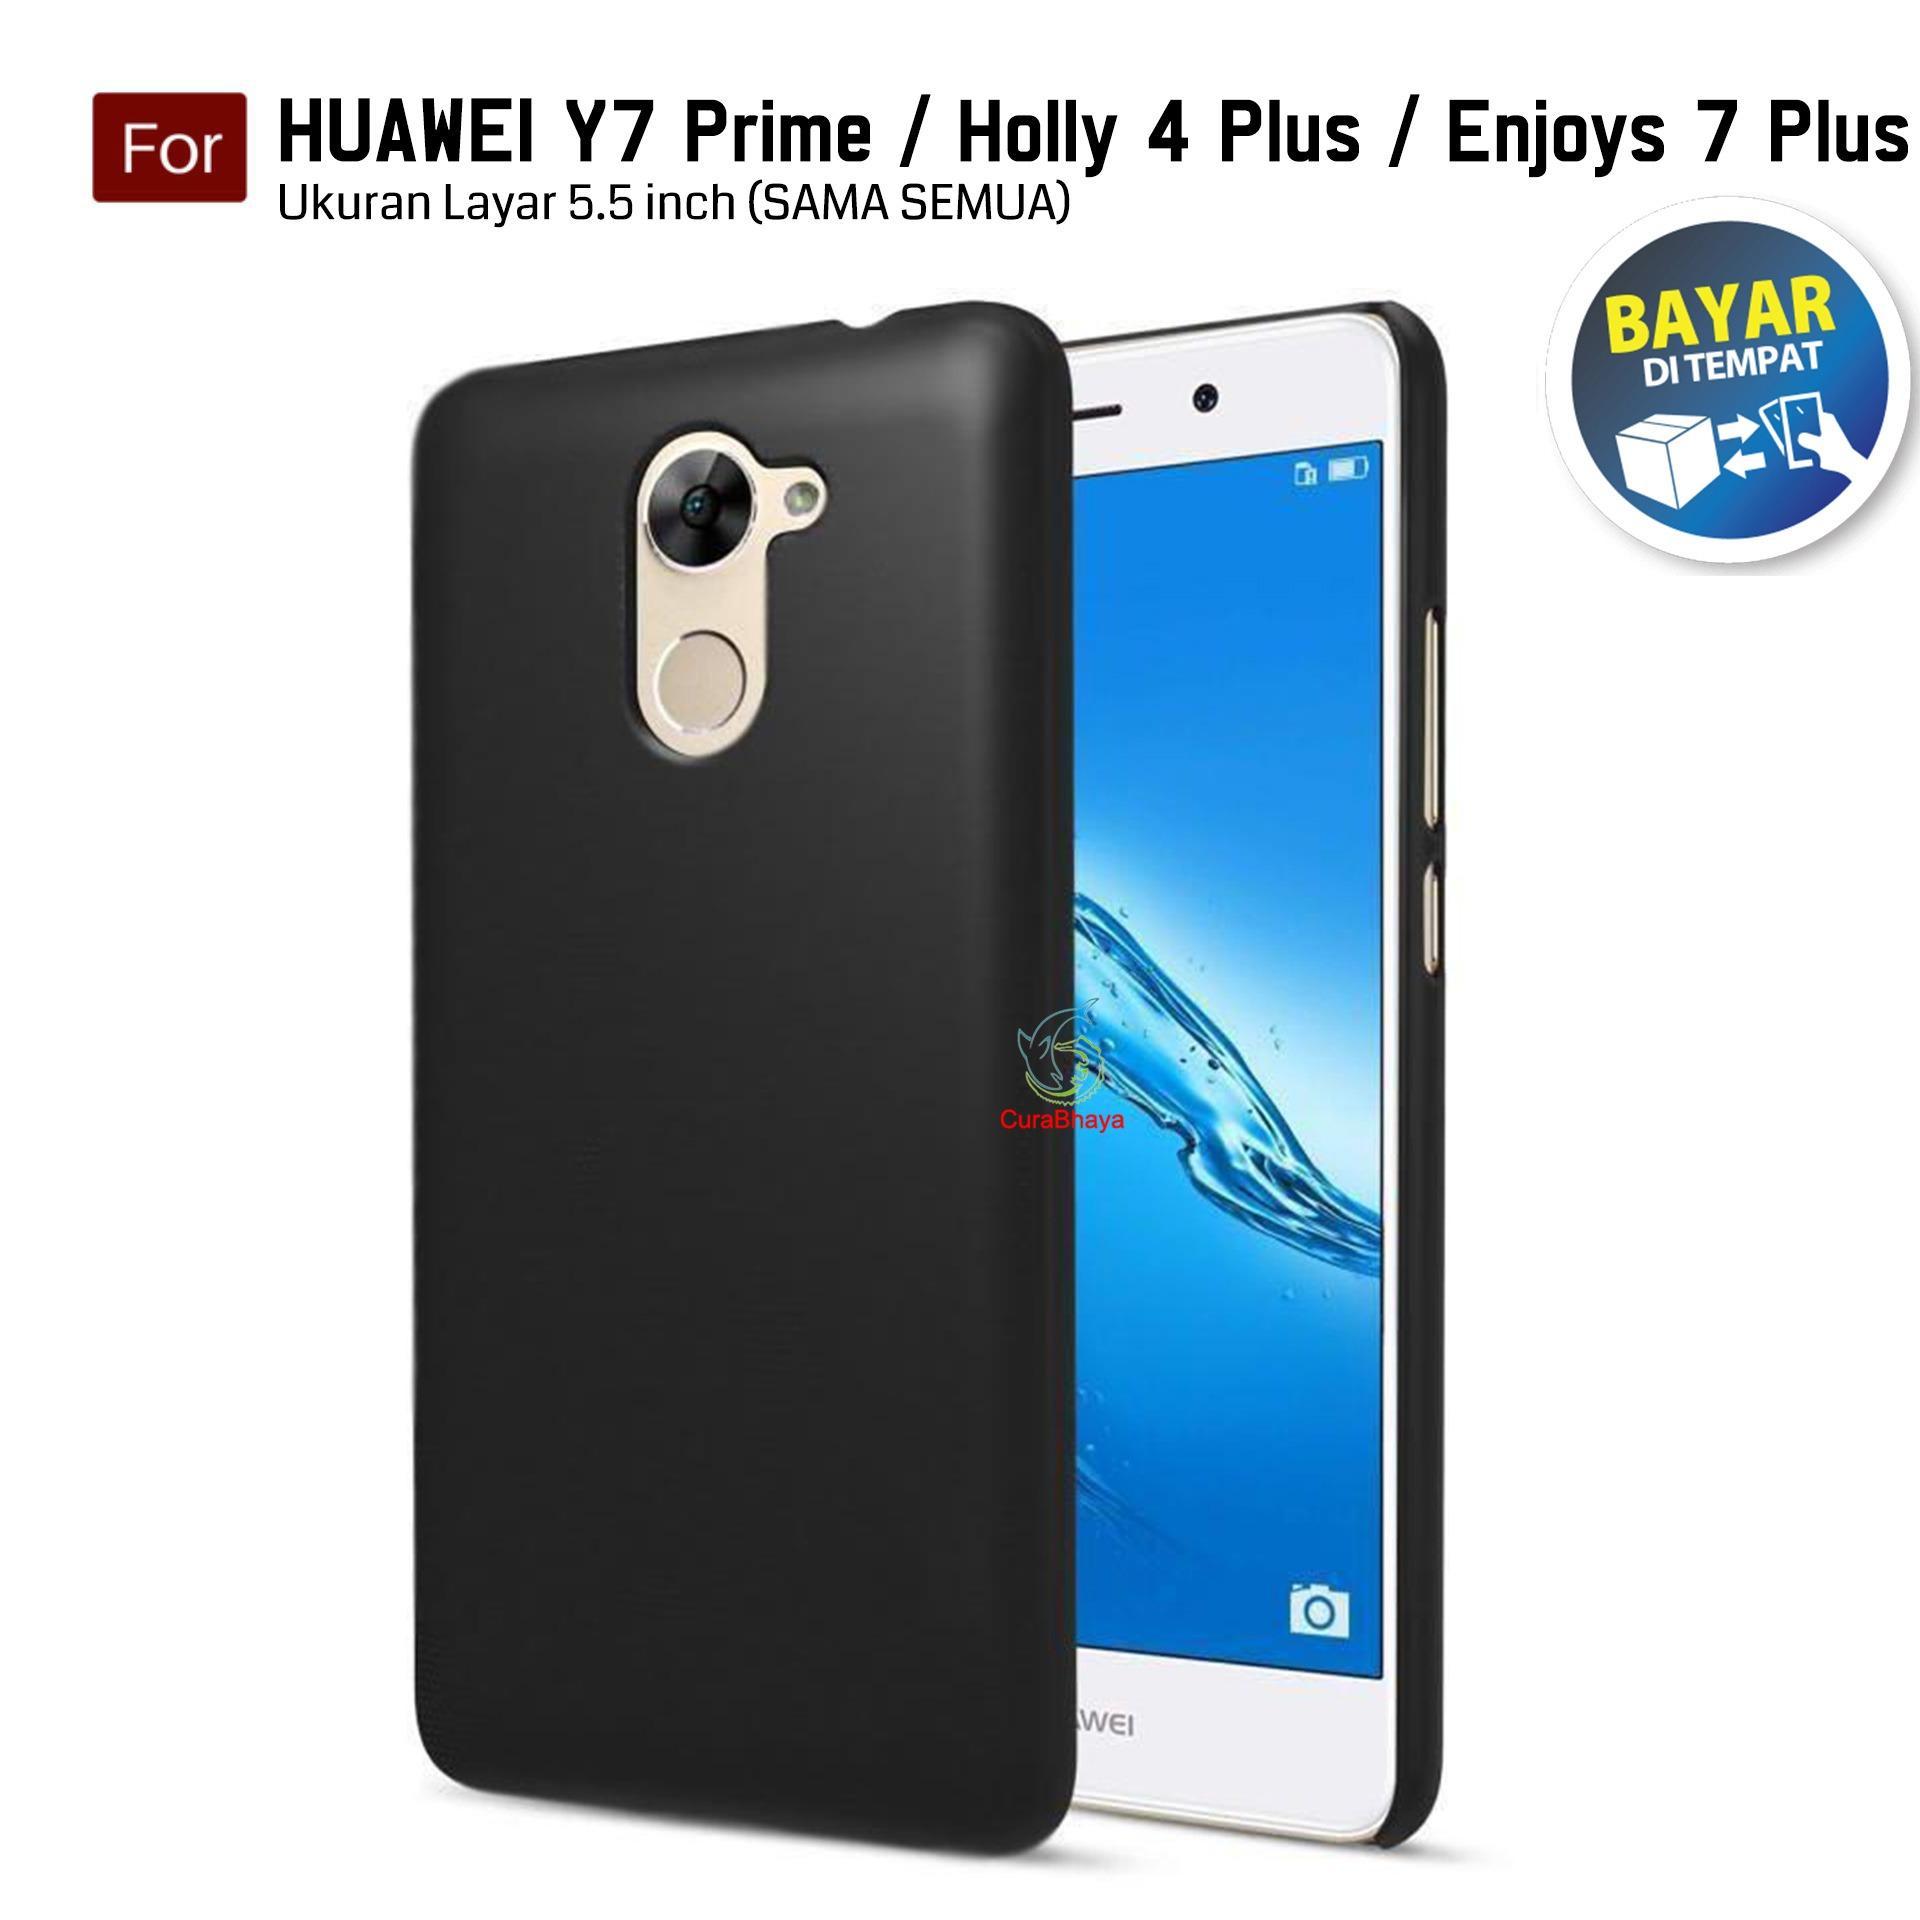 Midnight Huawei Y7 Prime / Holly 4+ Plus / Enjoys 7+ Plus | Slim Case Black Matte Softcase Premium Baby Skin - Hitam